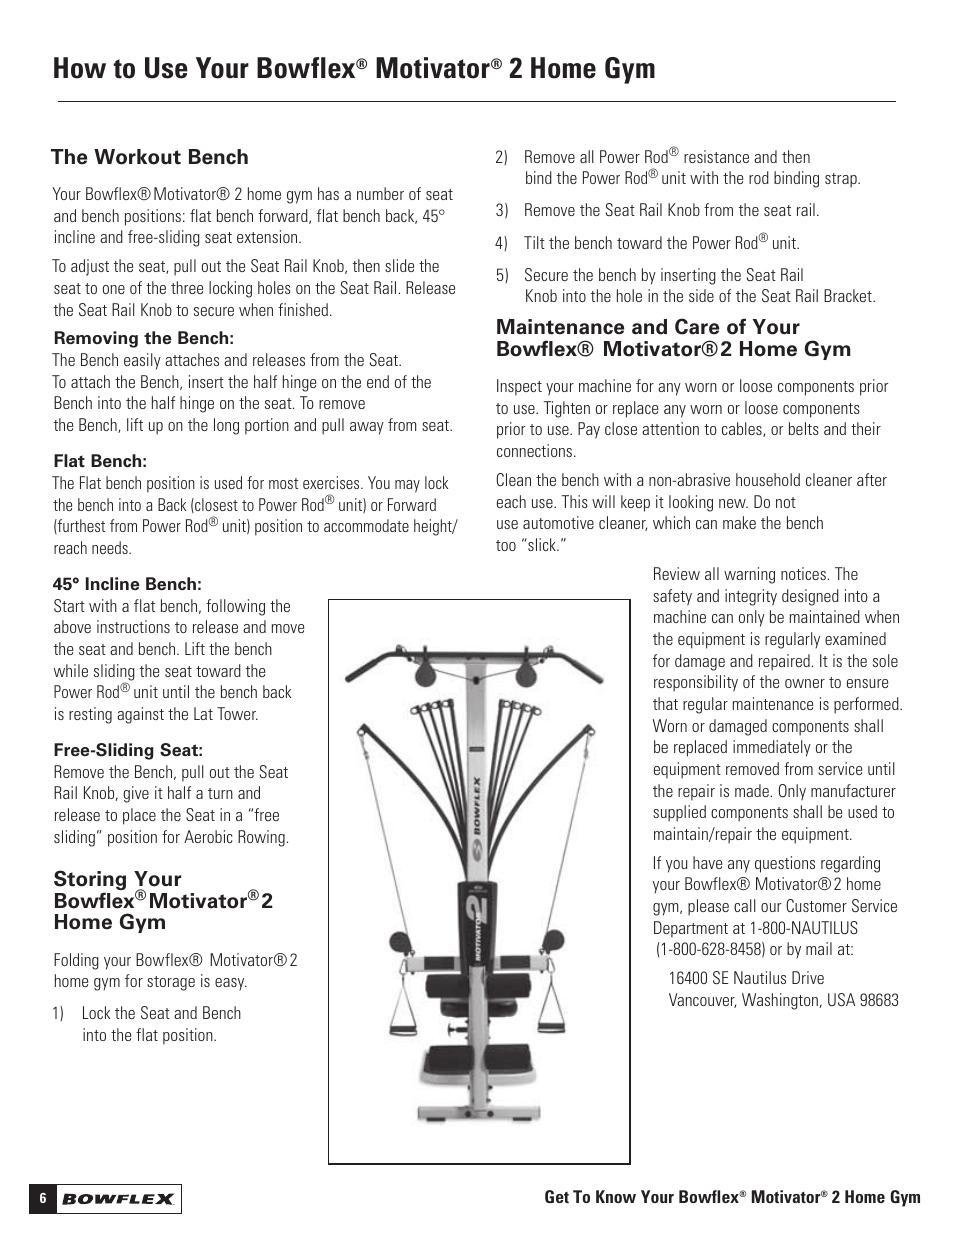 Surprising How To Use Your Bowflex Motivator 2 Home Gym Bowflex Download Free Architecture Designs Scobabritishbridgeorg